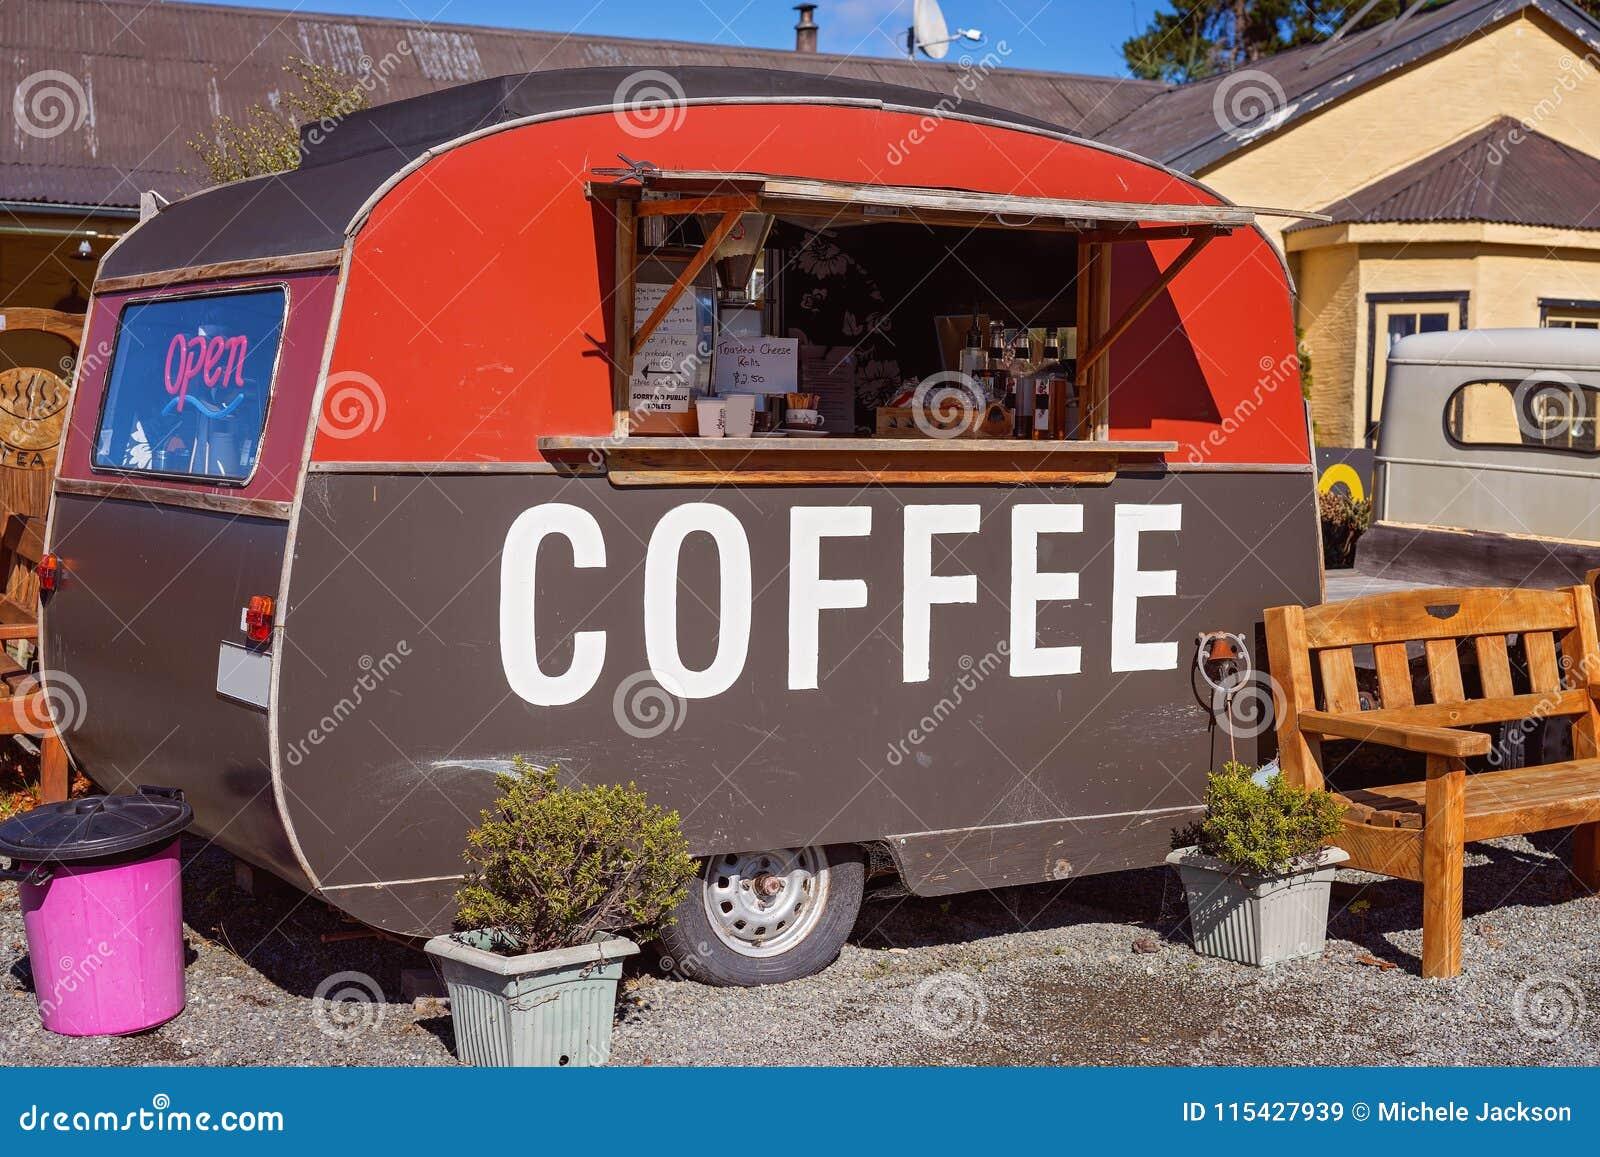 Old Coffee Van Roadside In Νέα Ζηλανδία